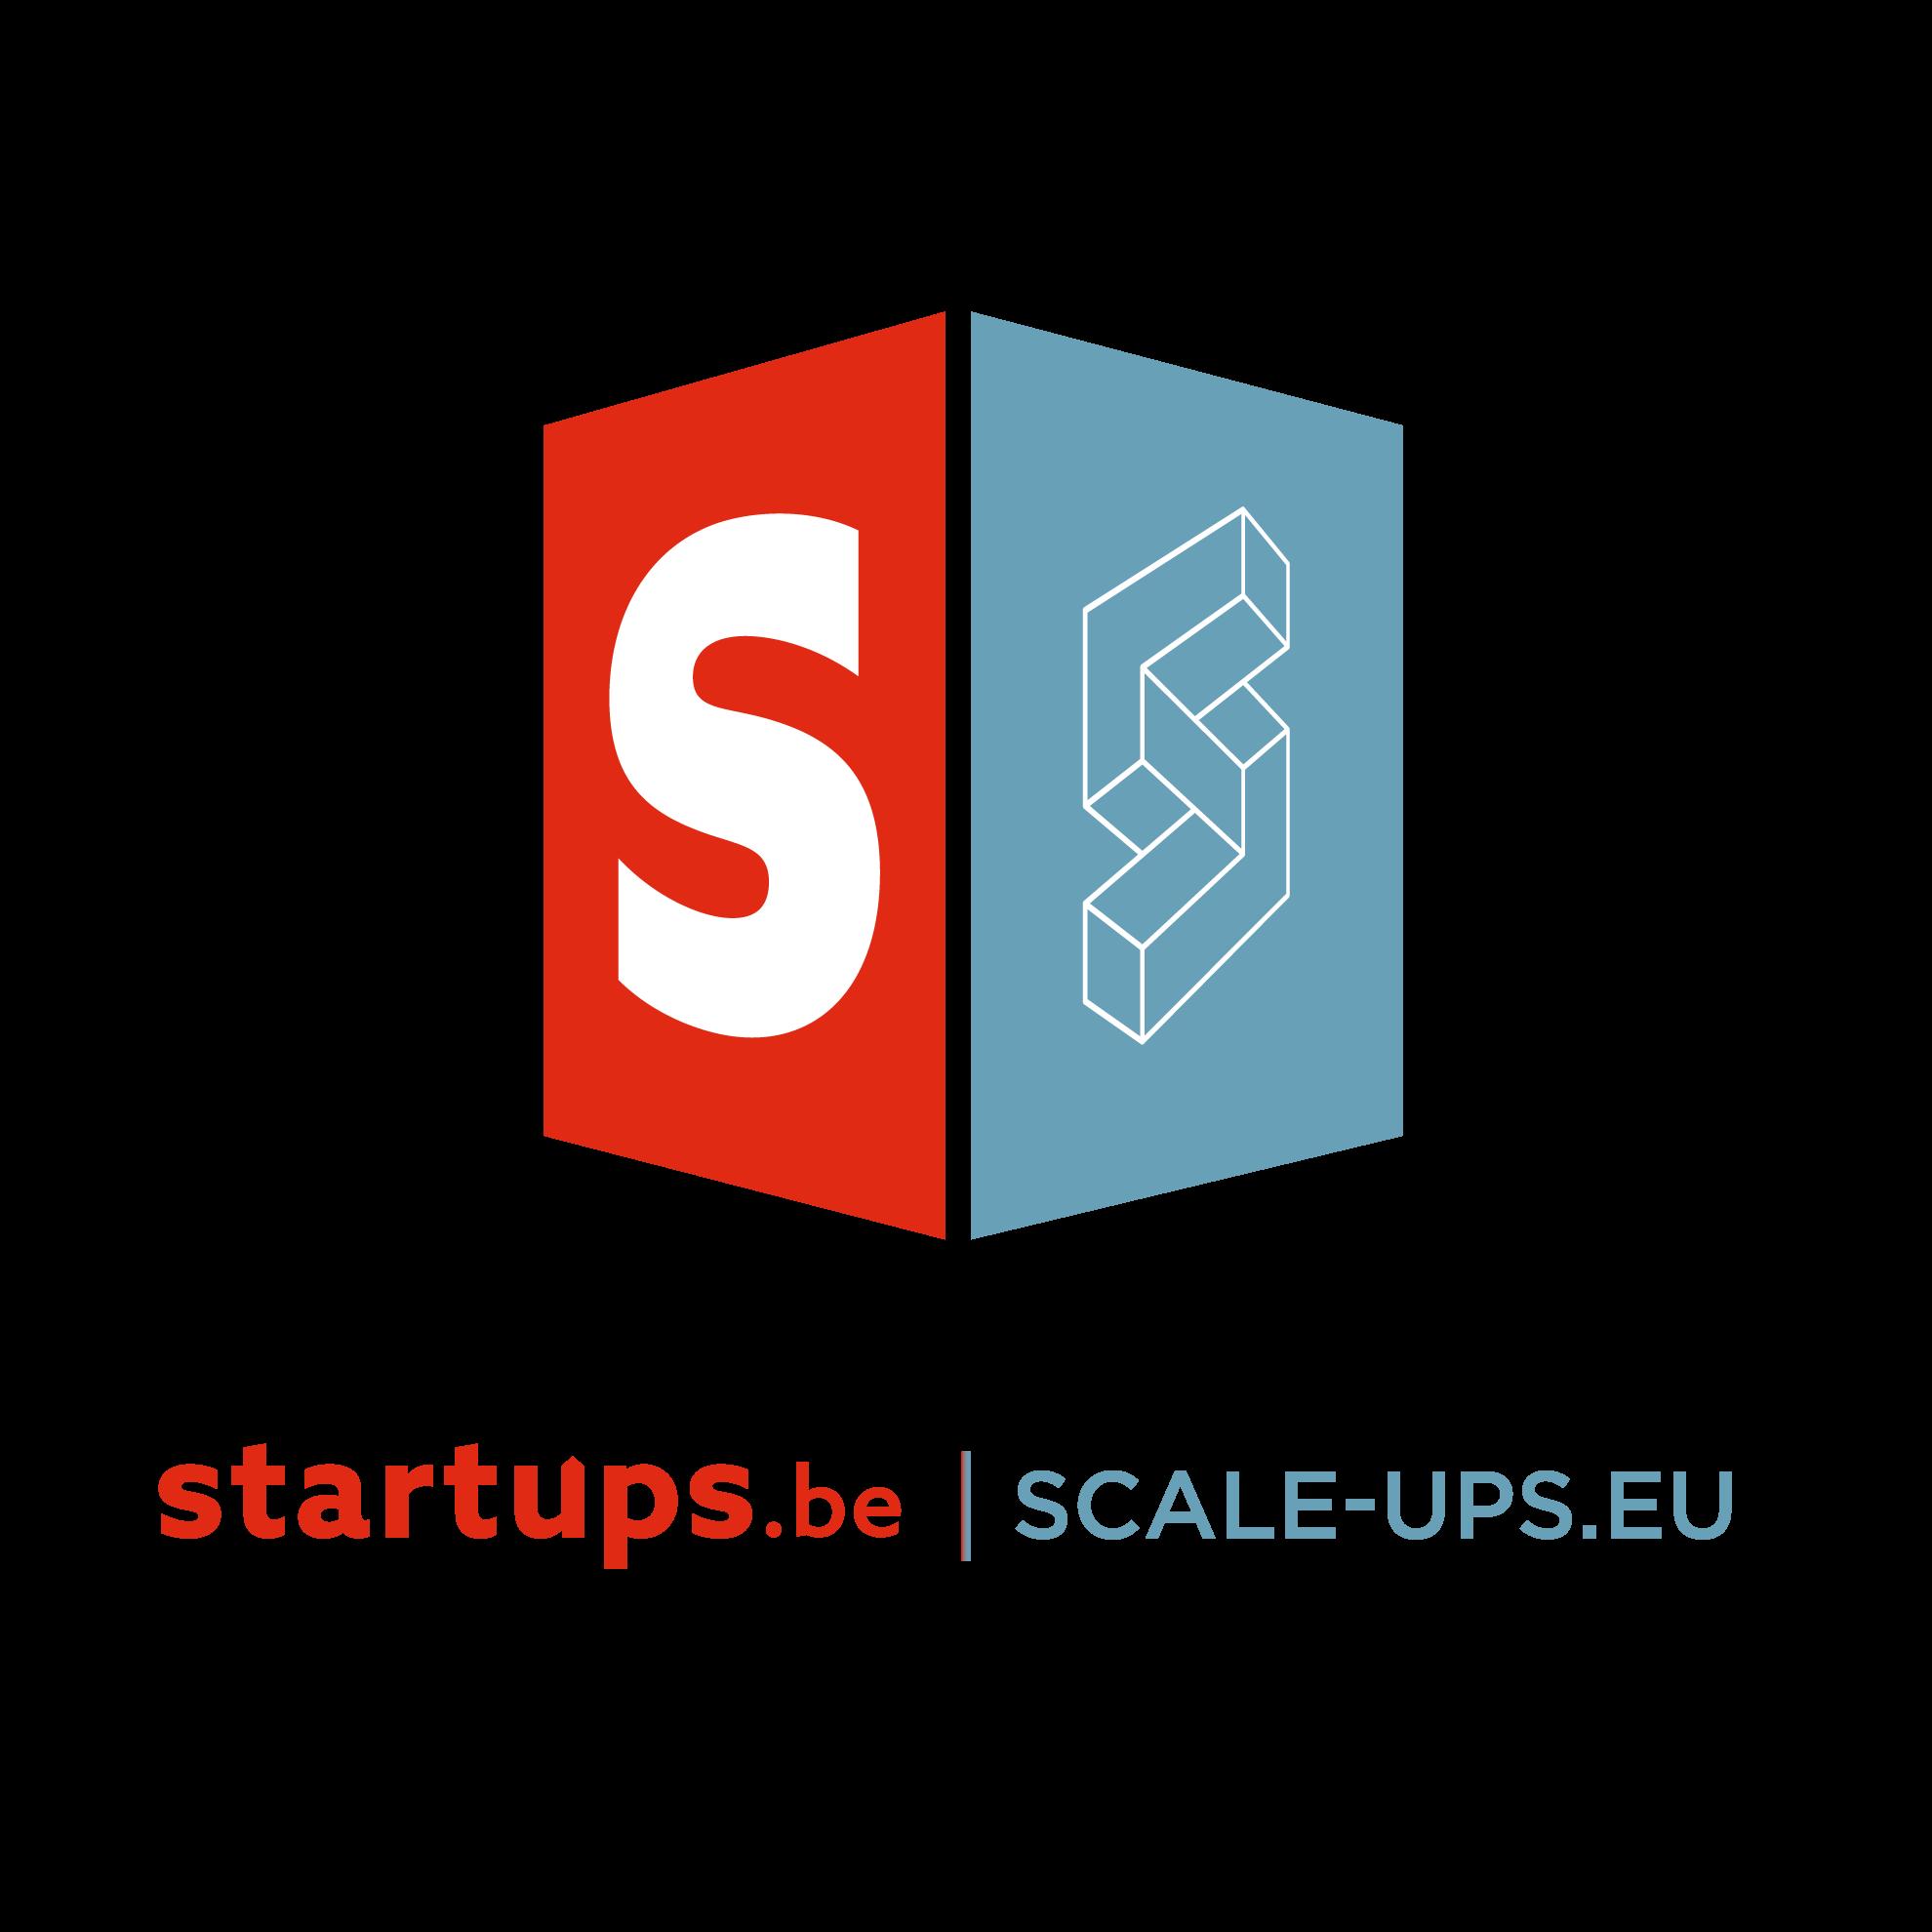 Startups.be | Scale-Ups.eu